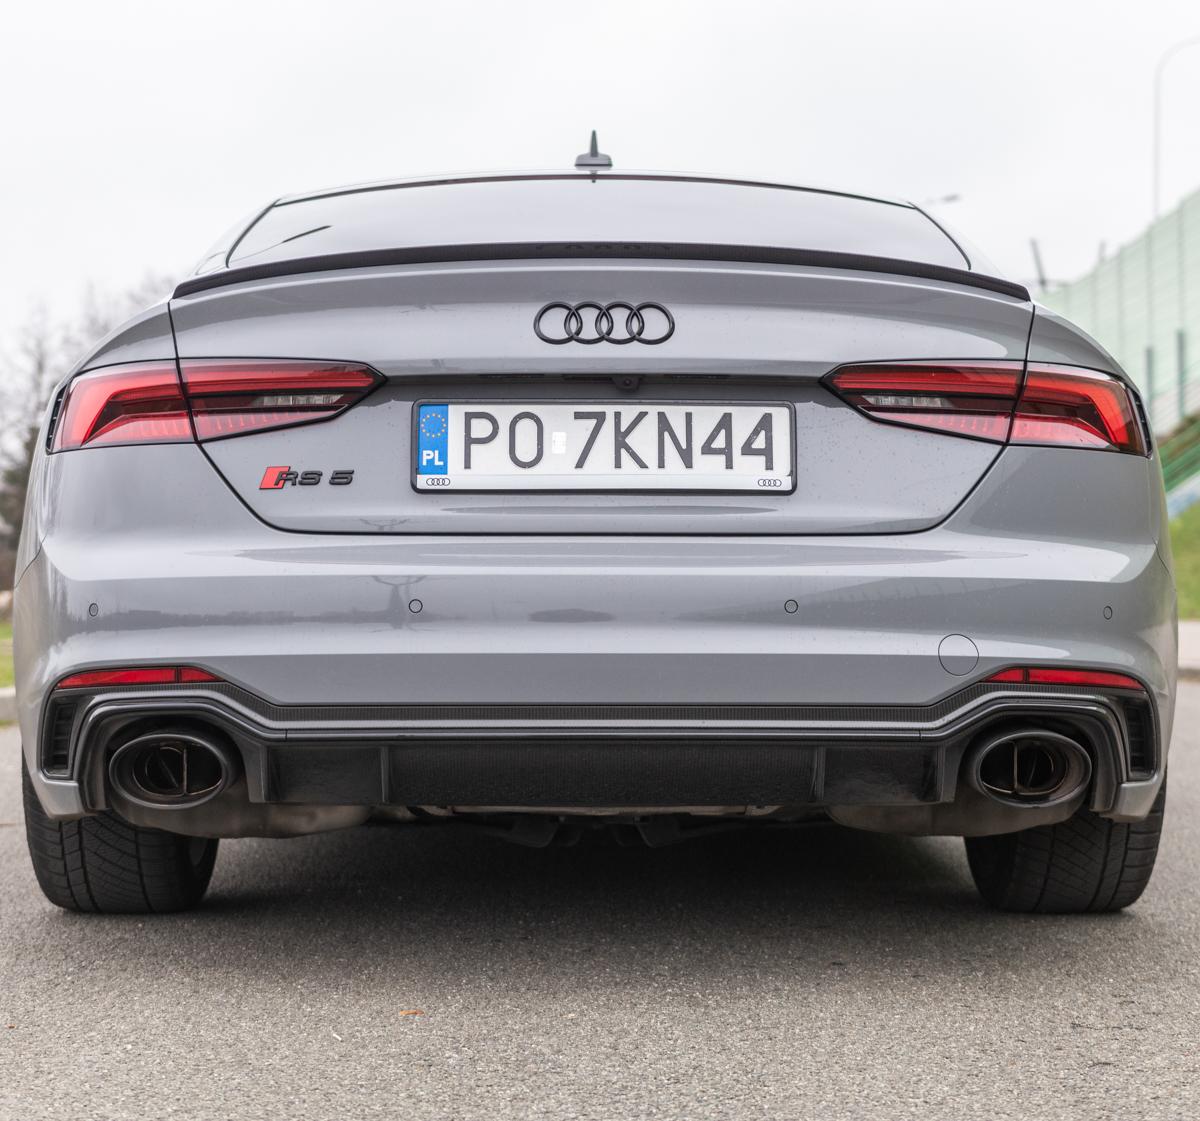 Audi RS5 Sportback BMW X3 M Competition